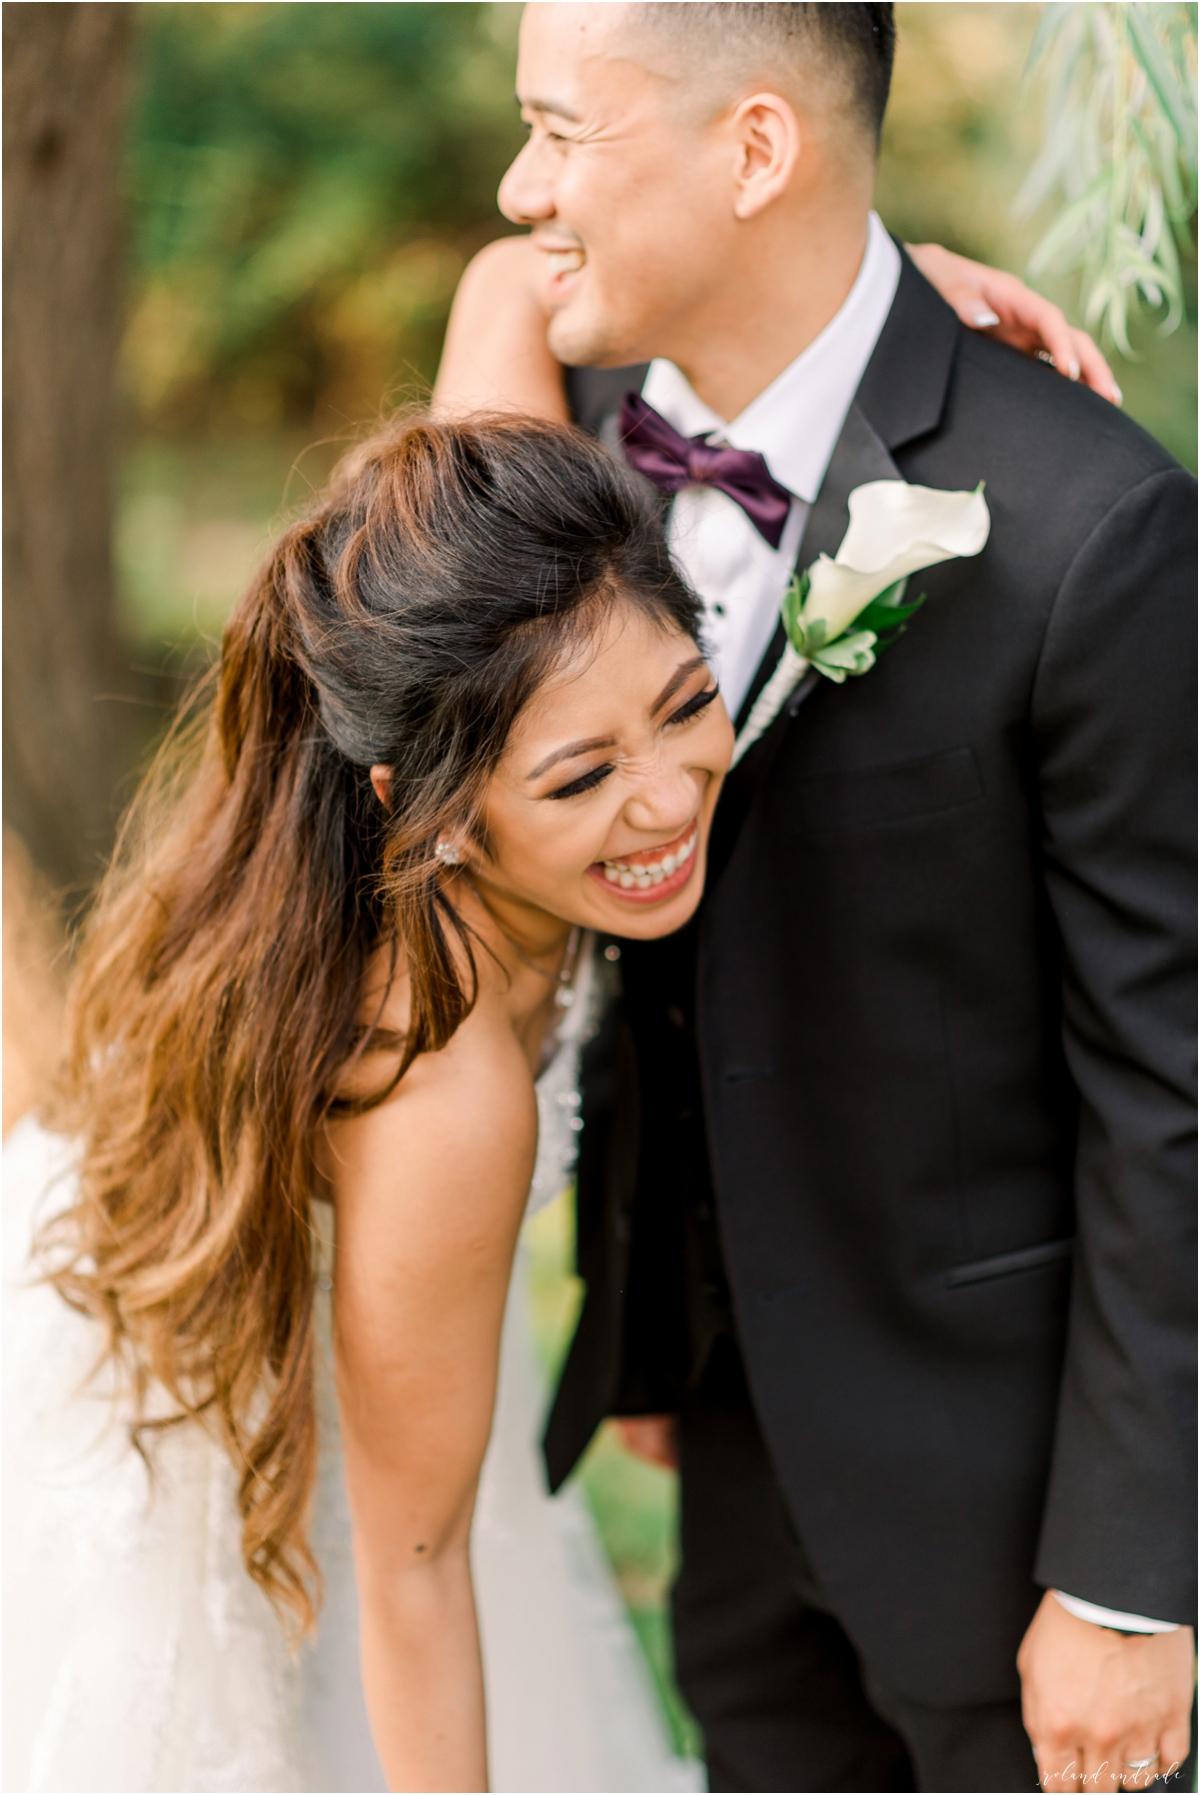 Meridian Banquets Wedding, Rolling Meadows Illinois Wedding, Chicago Wedding Photographer, Aurora Wedding Photographer, Best Photographer In Aurora, Best Photographer In Chicago_0082.jpg